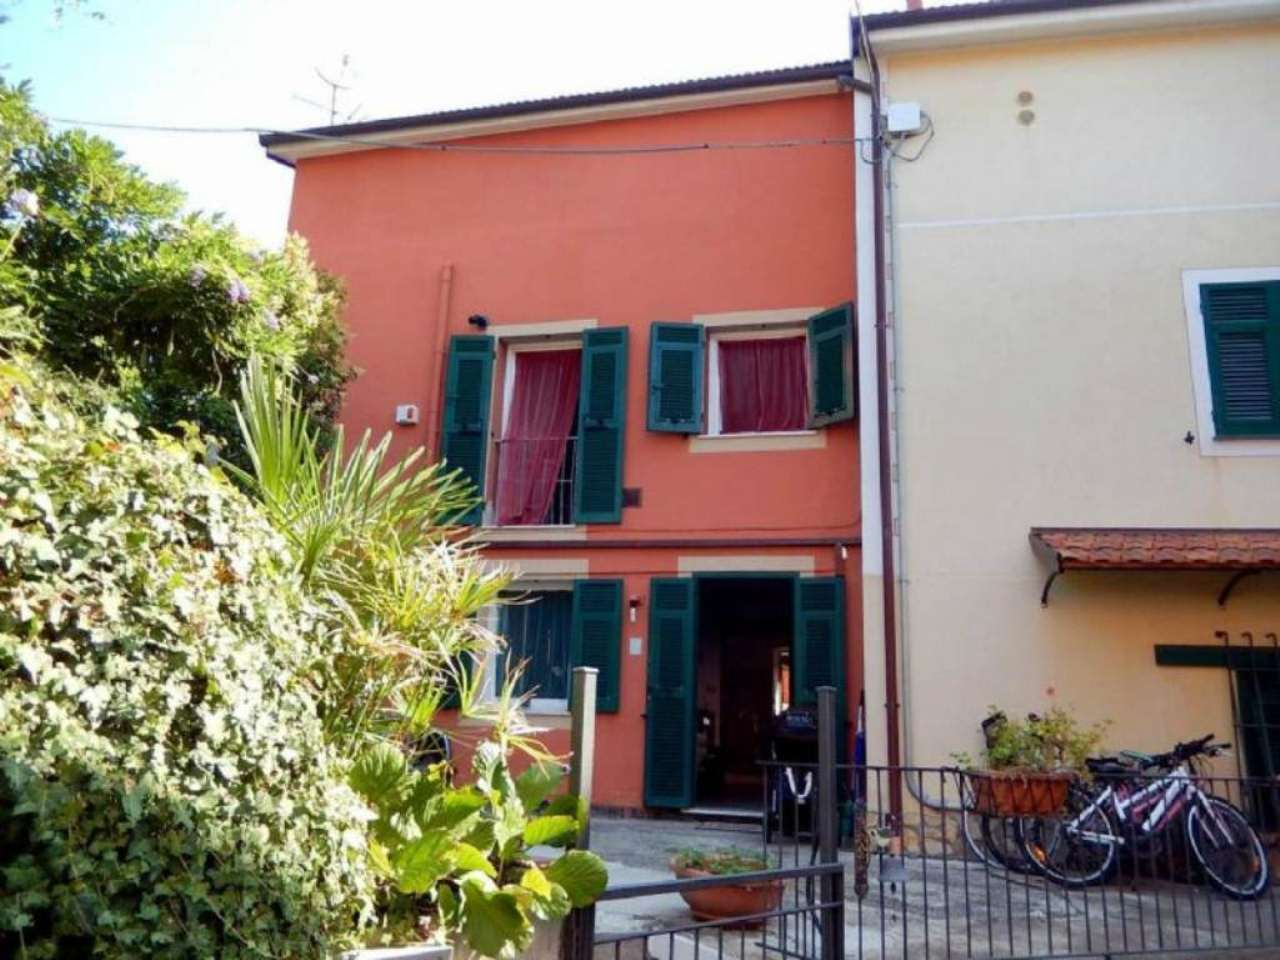 Appartamento in Vendita a Casarza Ligure